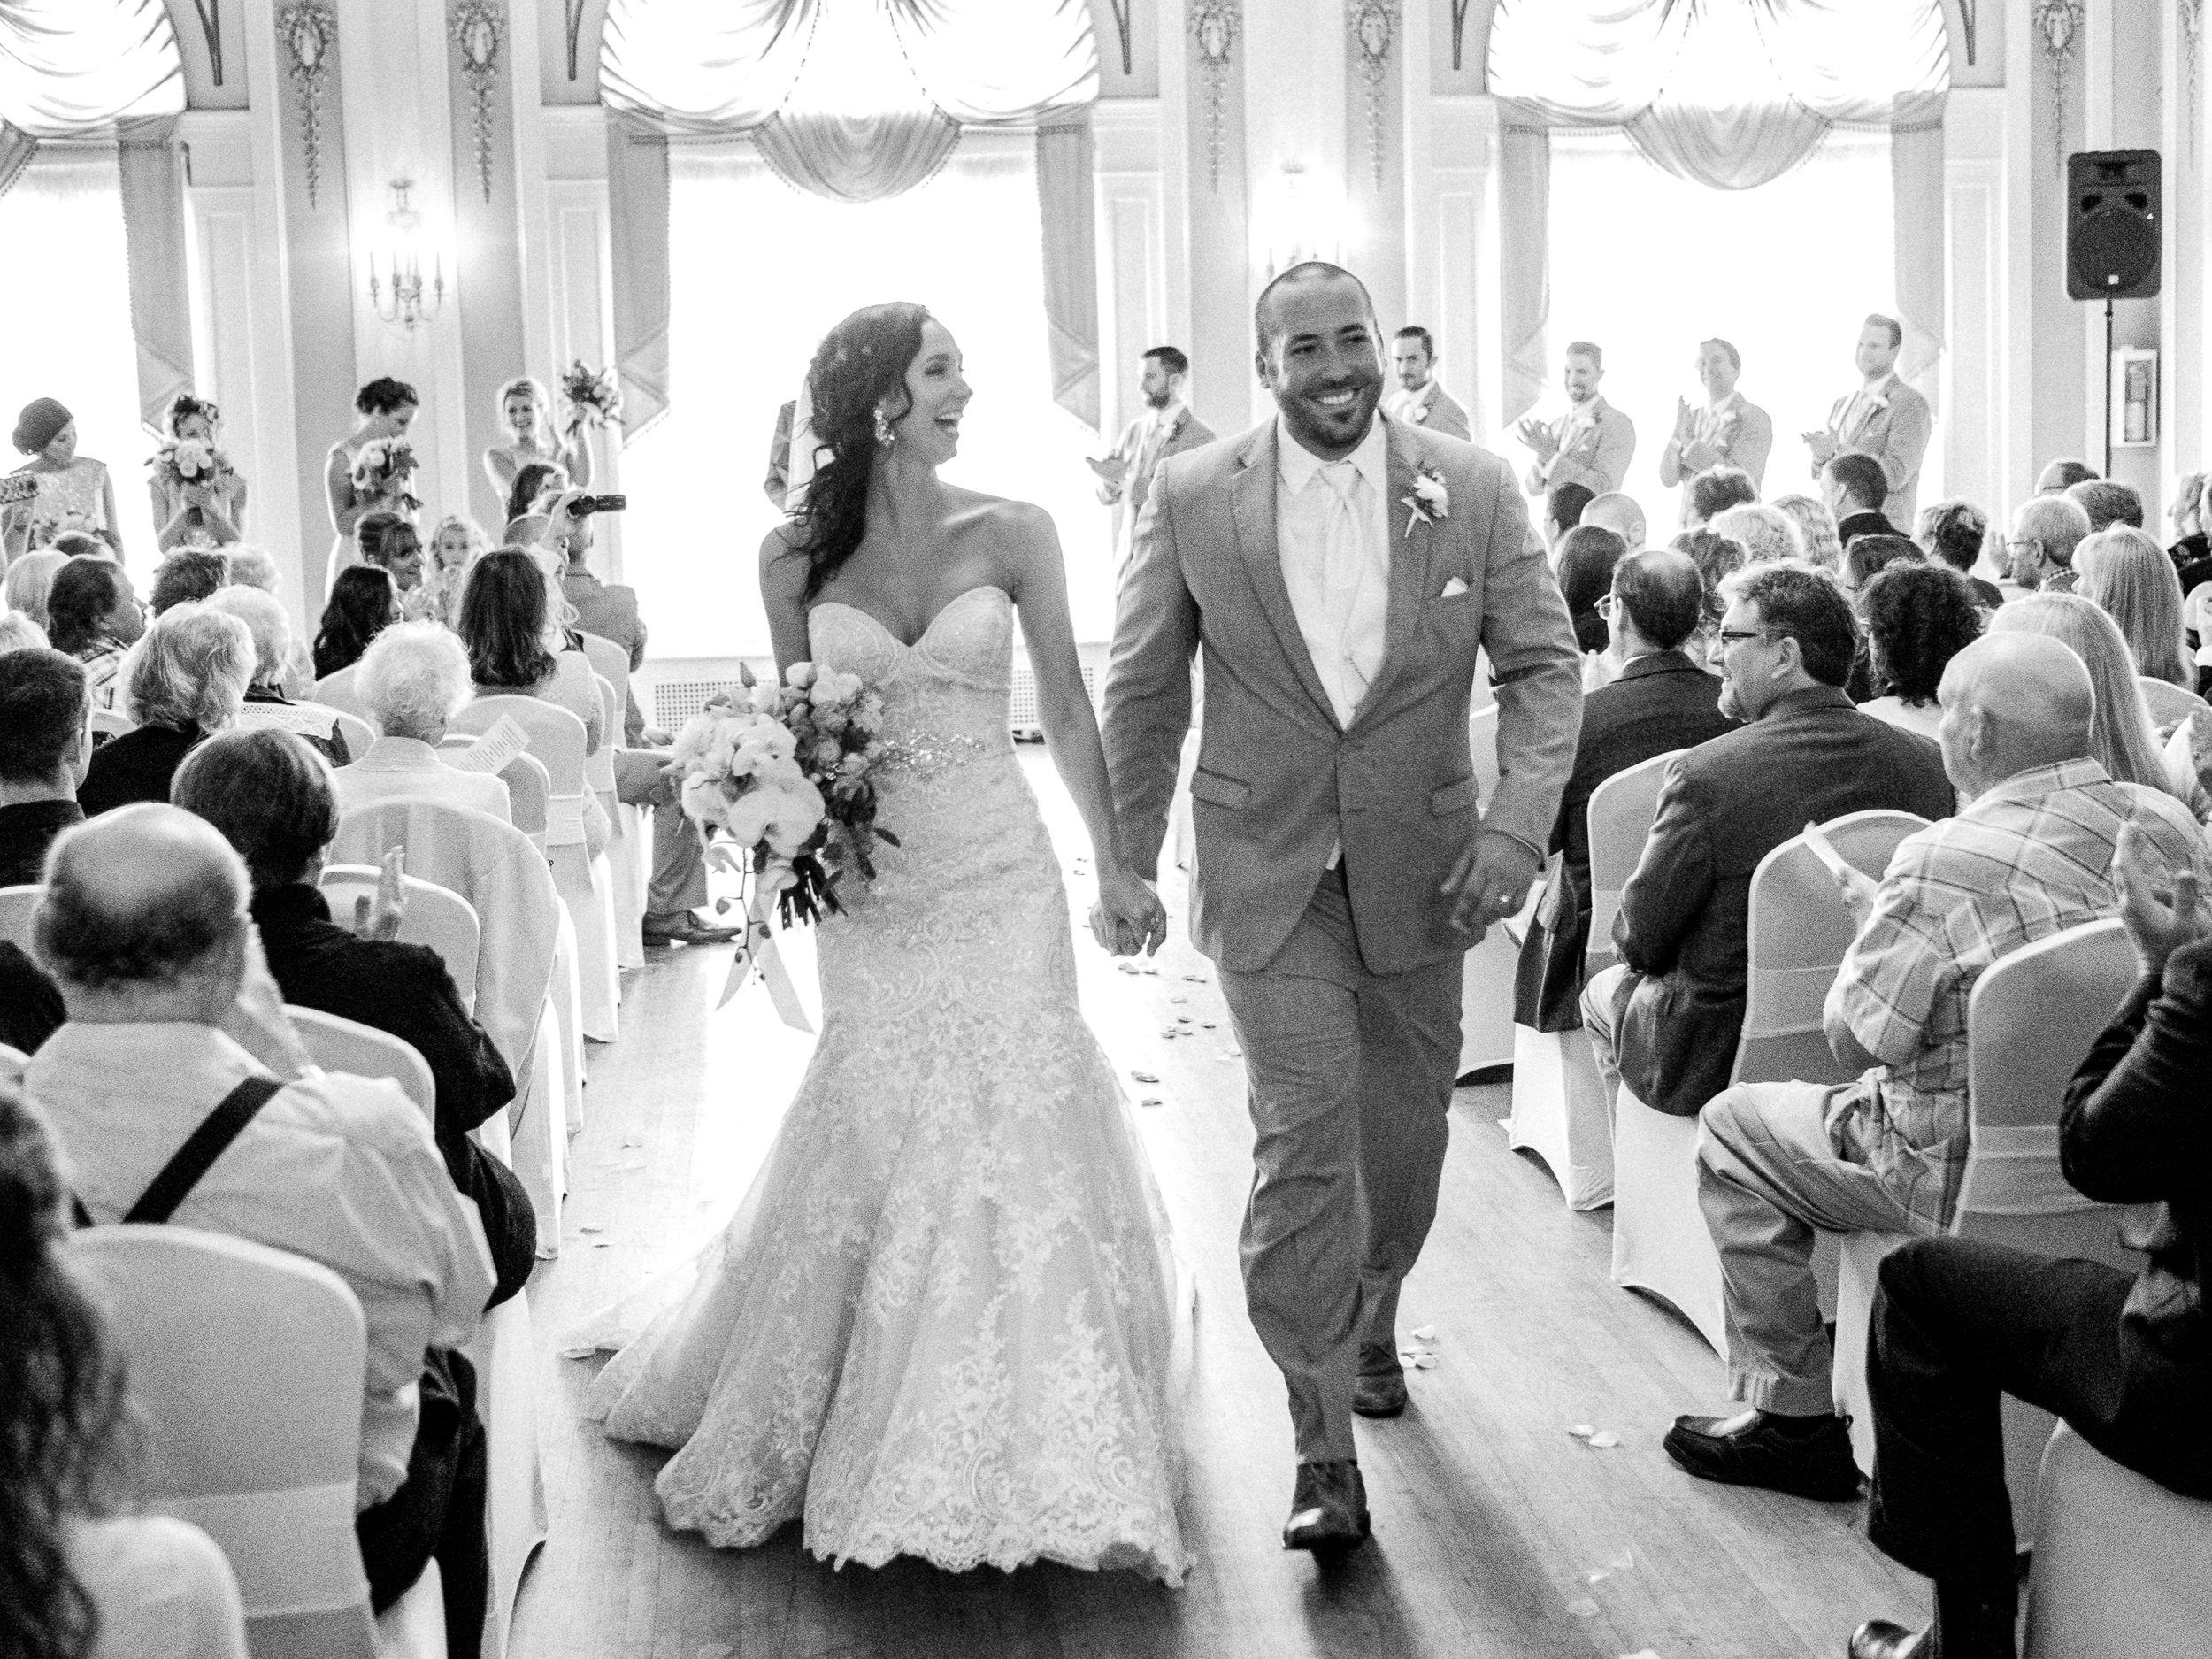 Duluth Wedding at Greysolon Ballroom